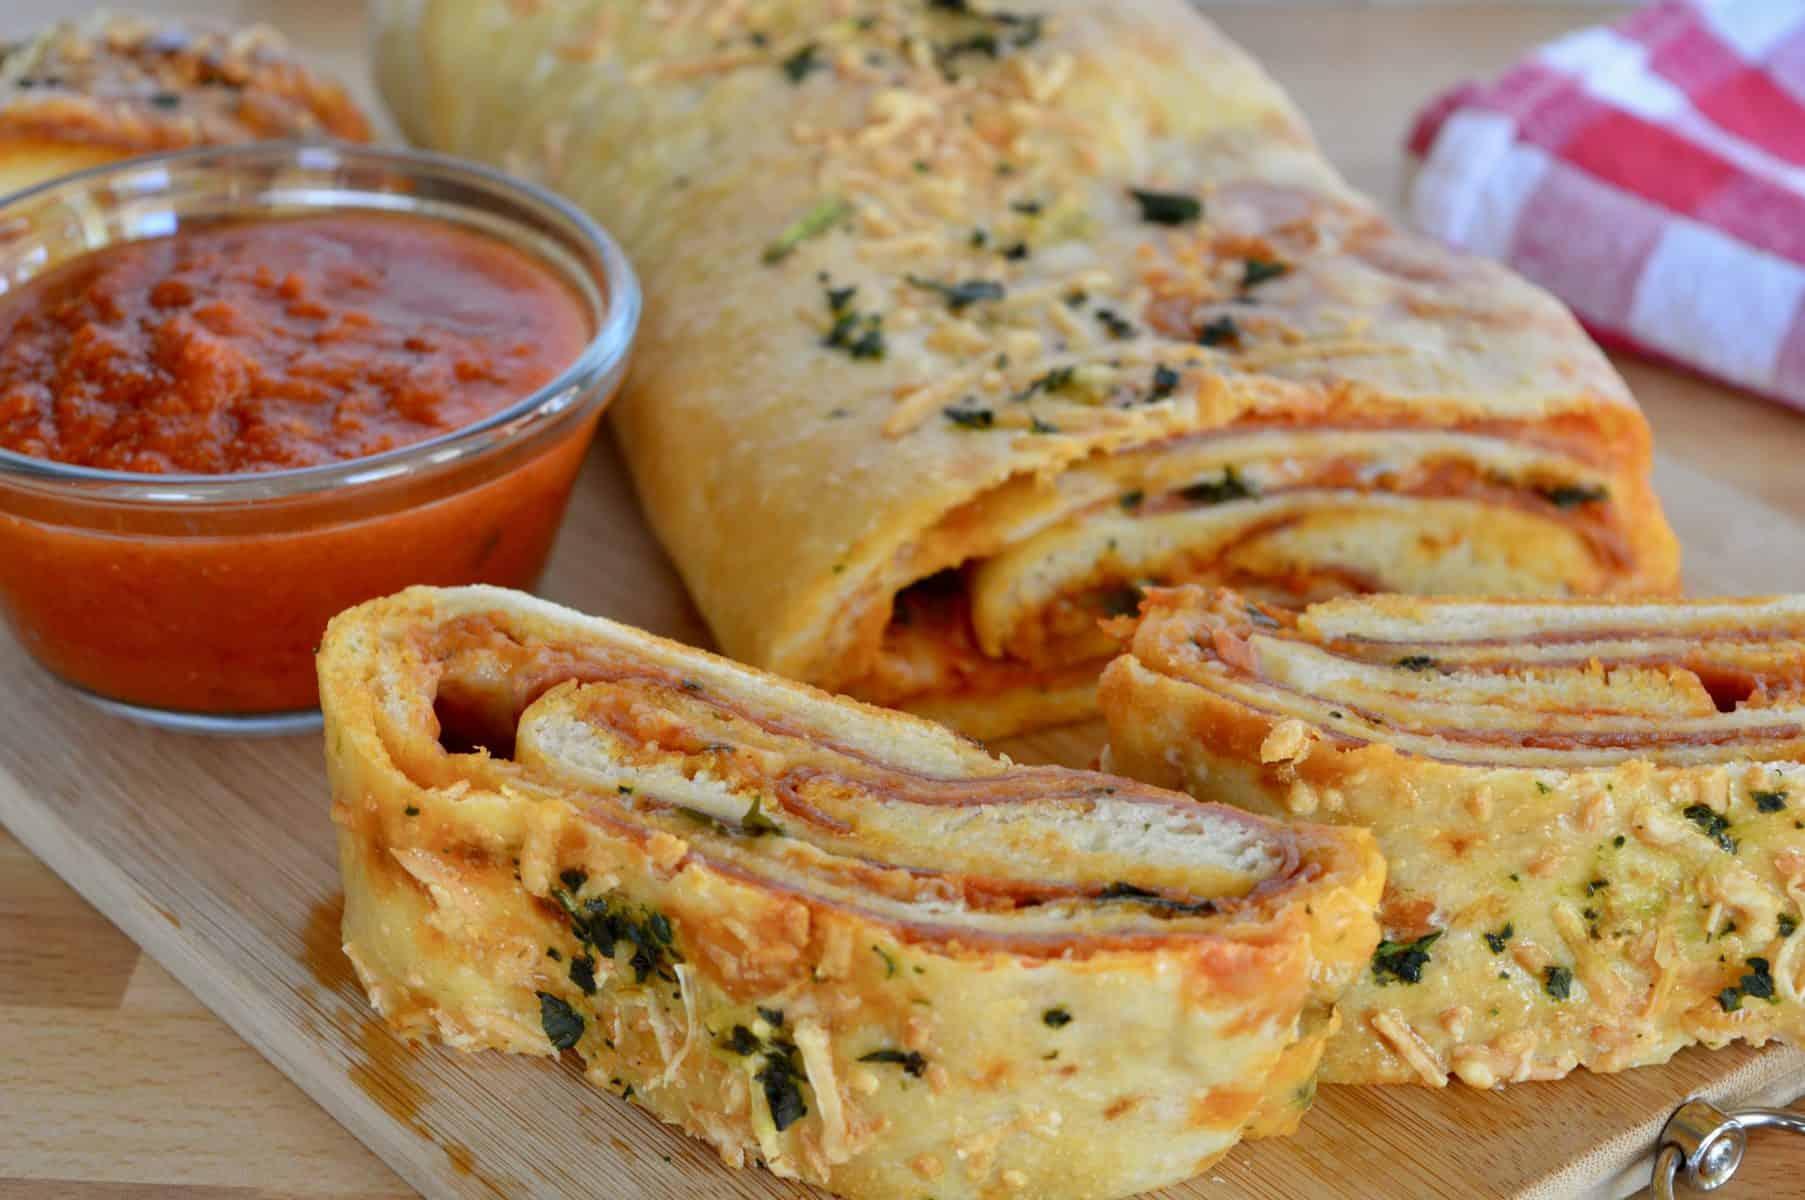 Italian Stromboli Recipe on a cutting board with marinara sauce for dipping.